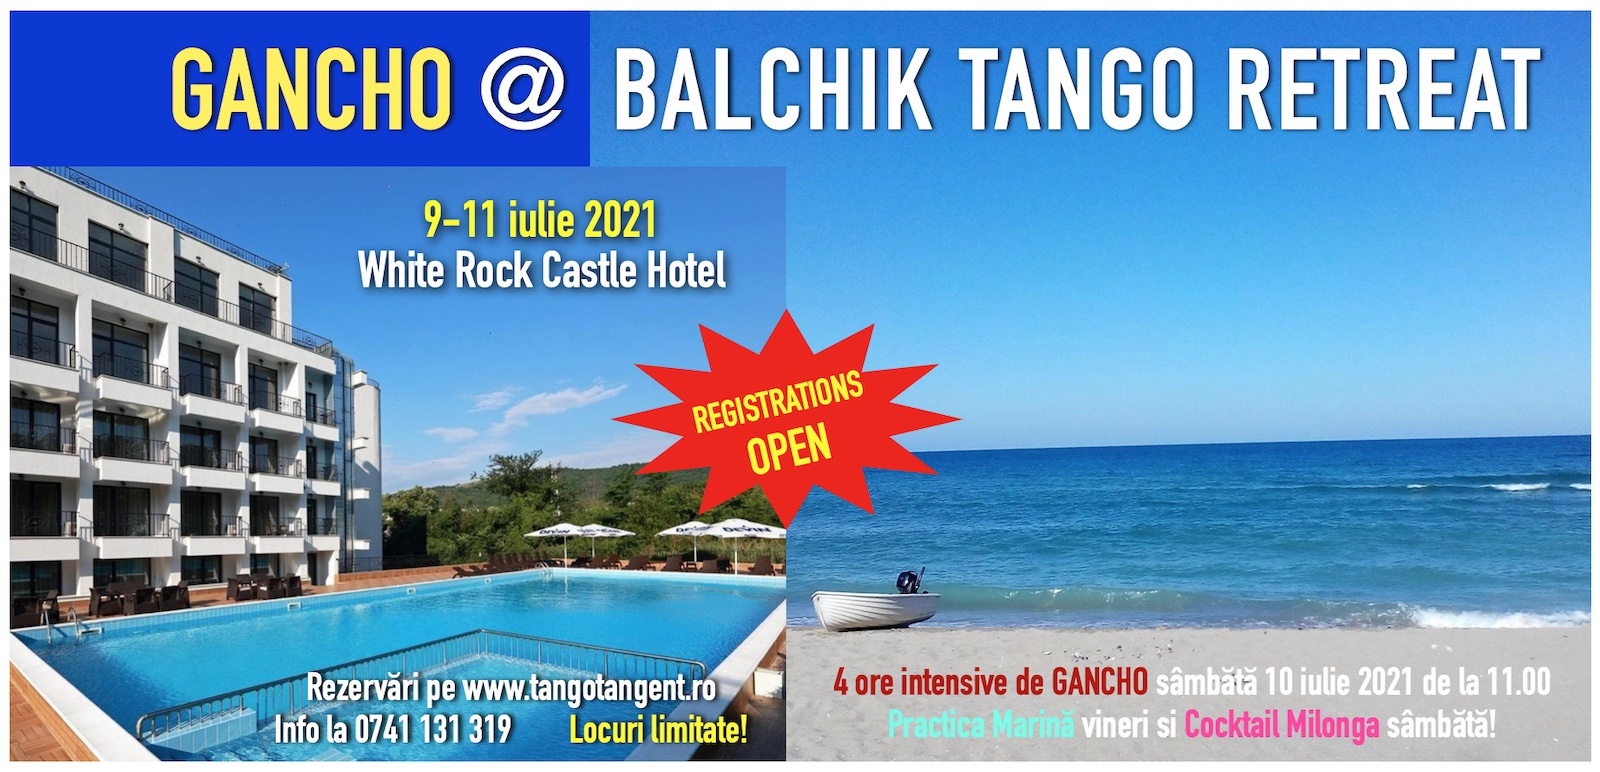 gancho la balchik tango retreat 1